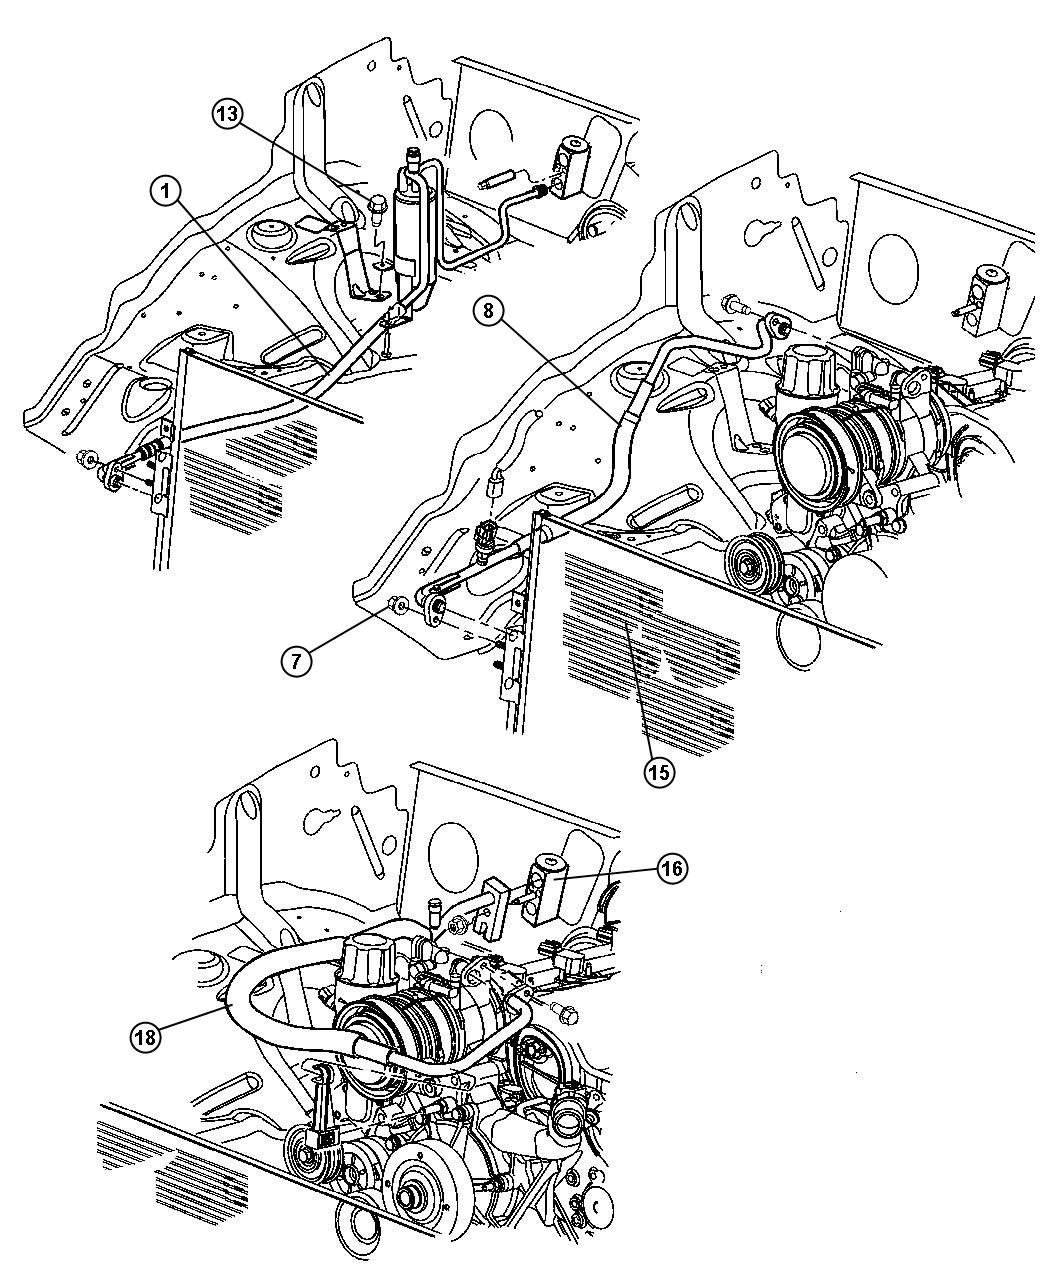 2000 dodge durango condenser  air conditioning  engine  related  radiator